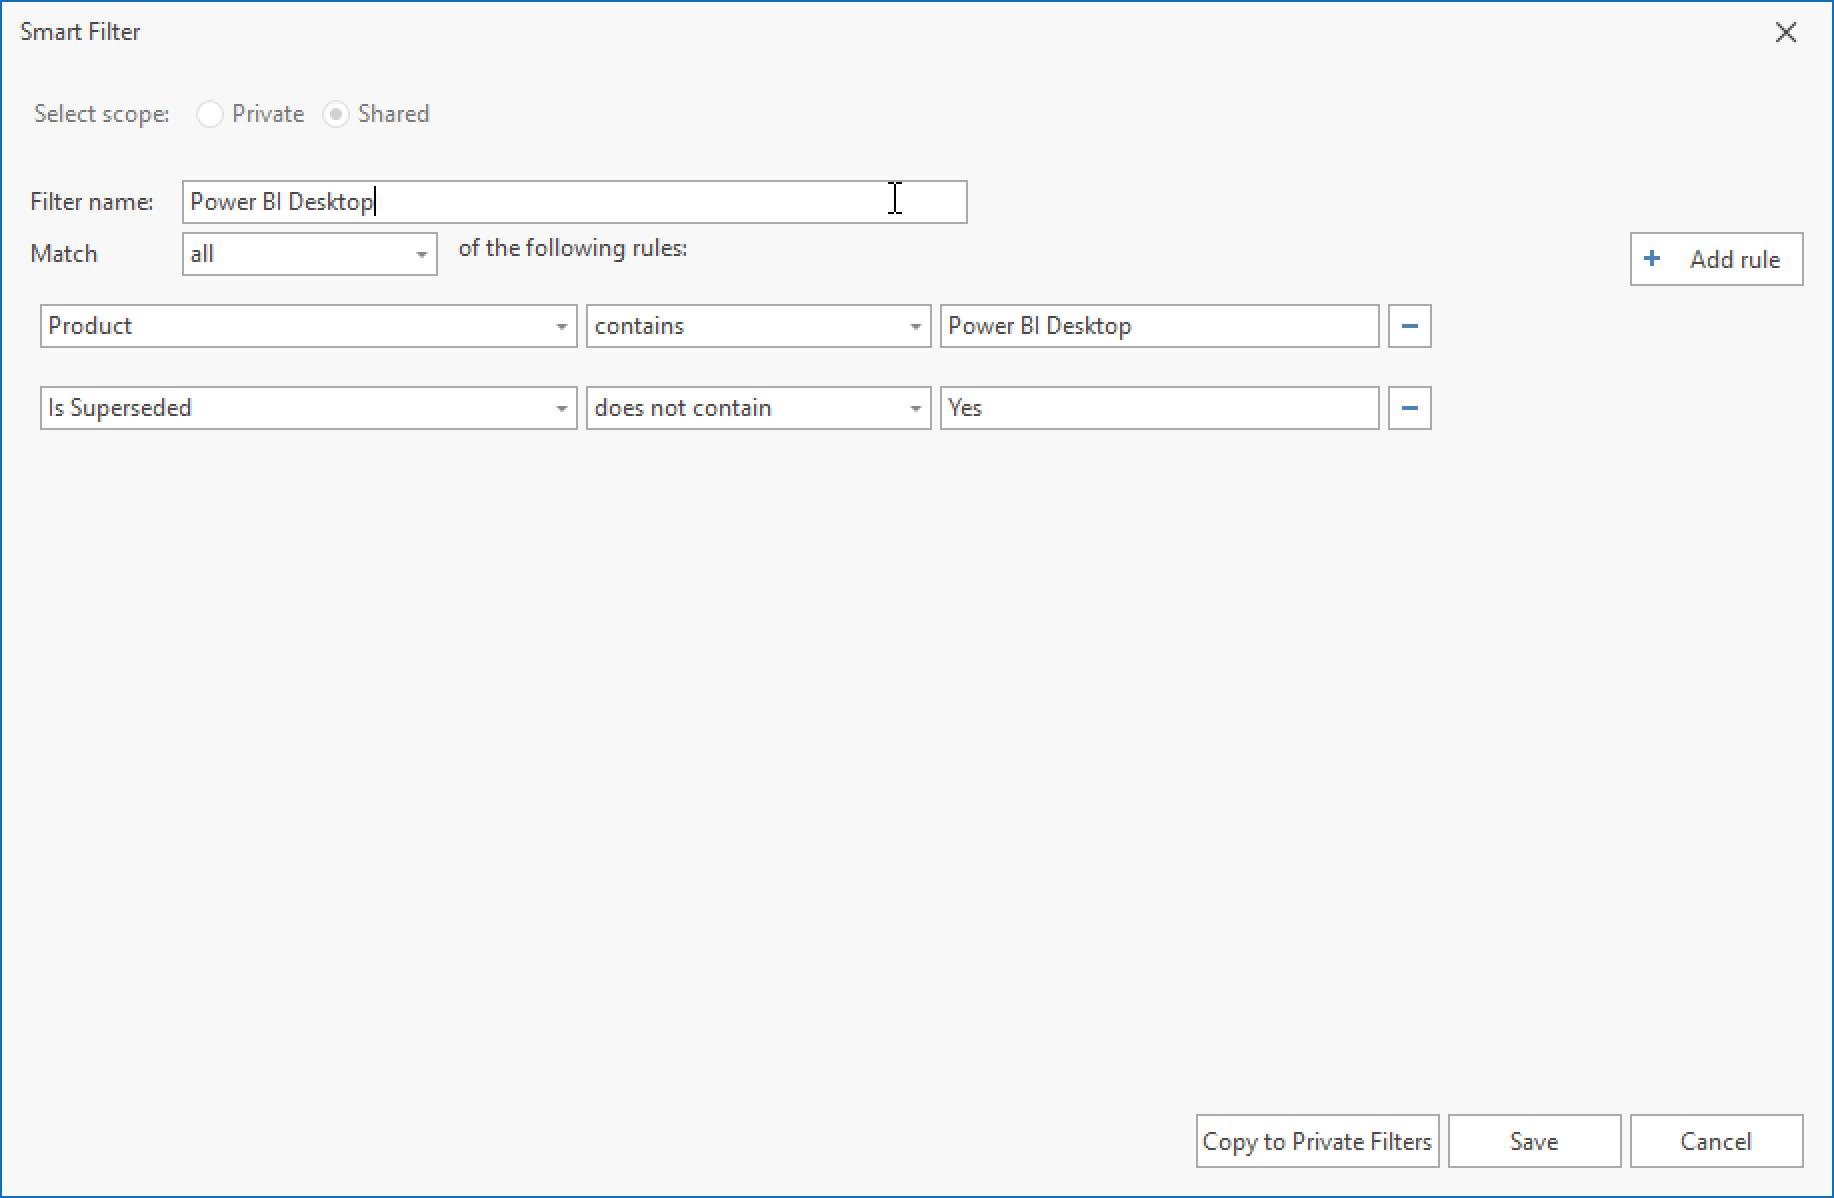 Power BI Desktop Smart Filter